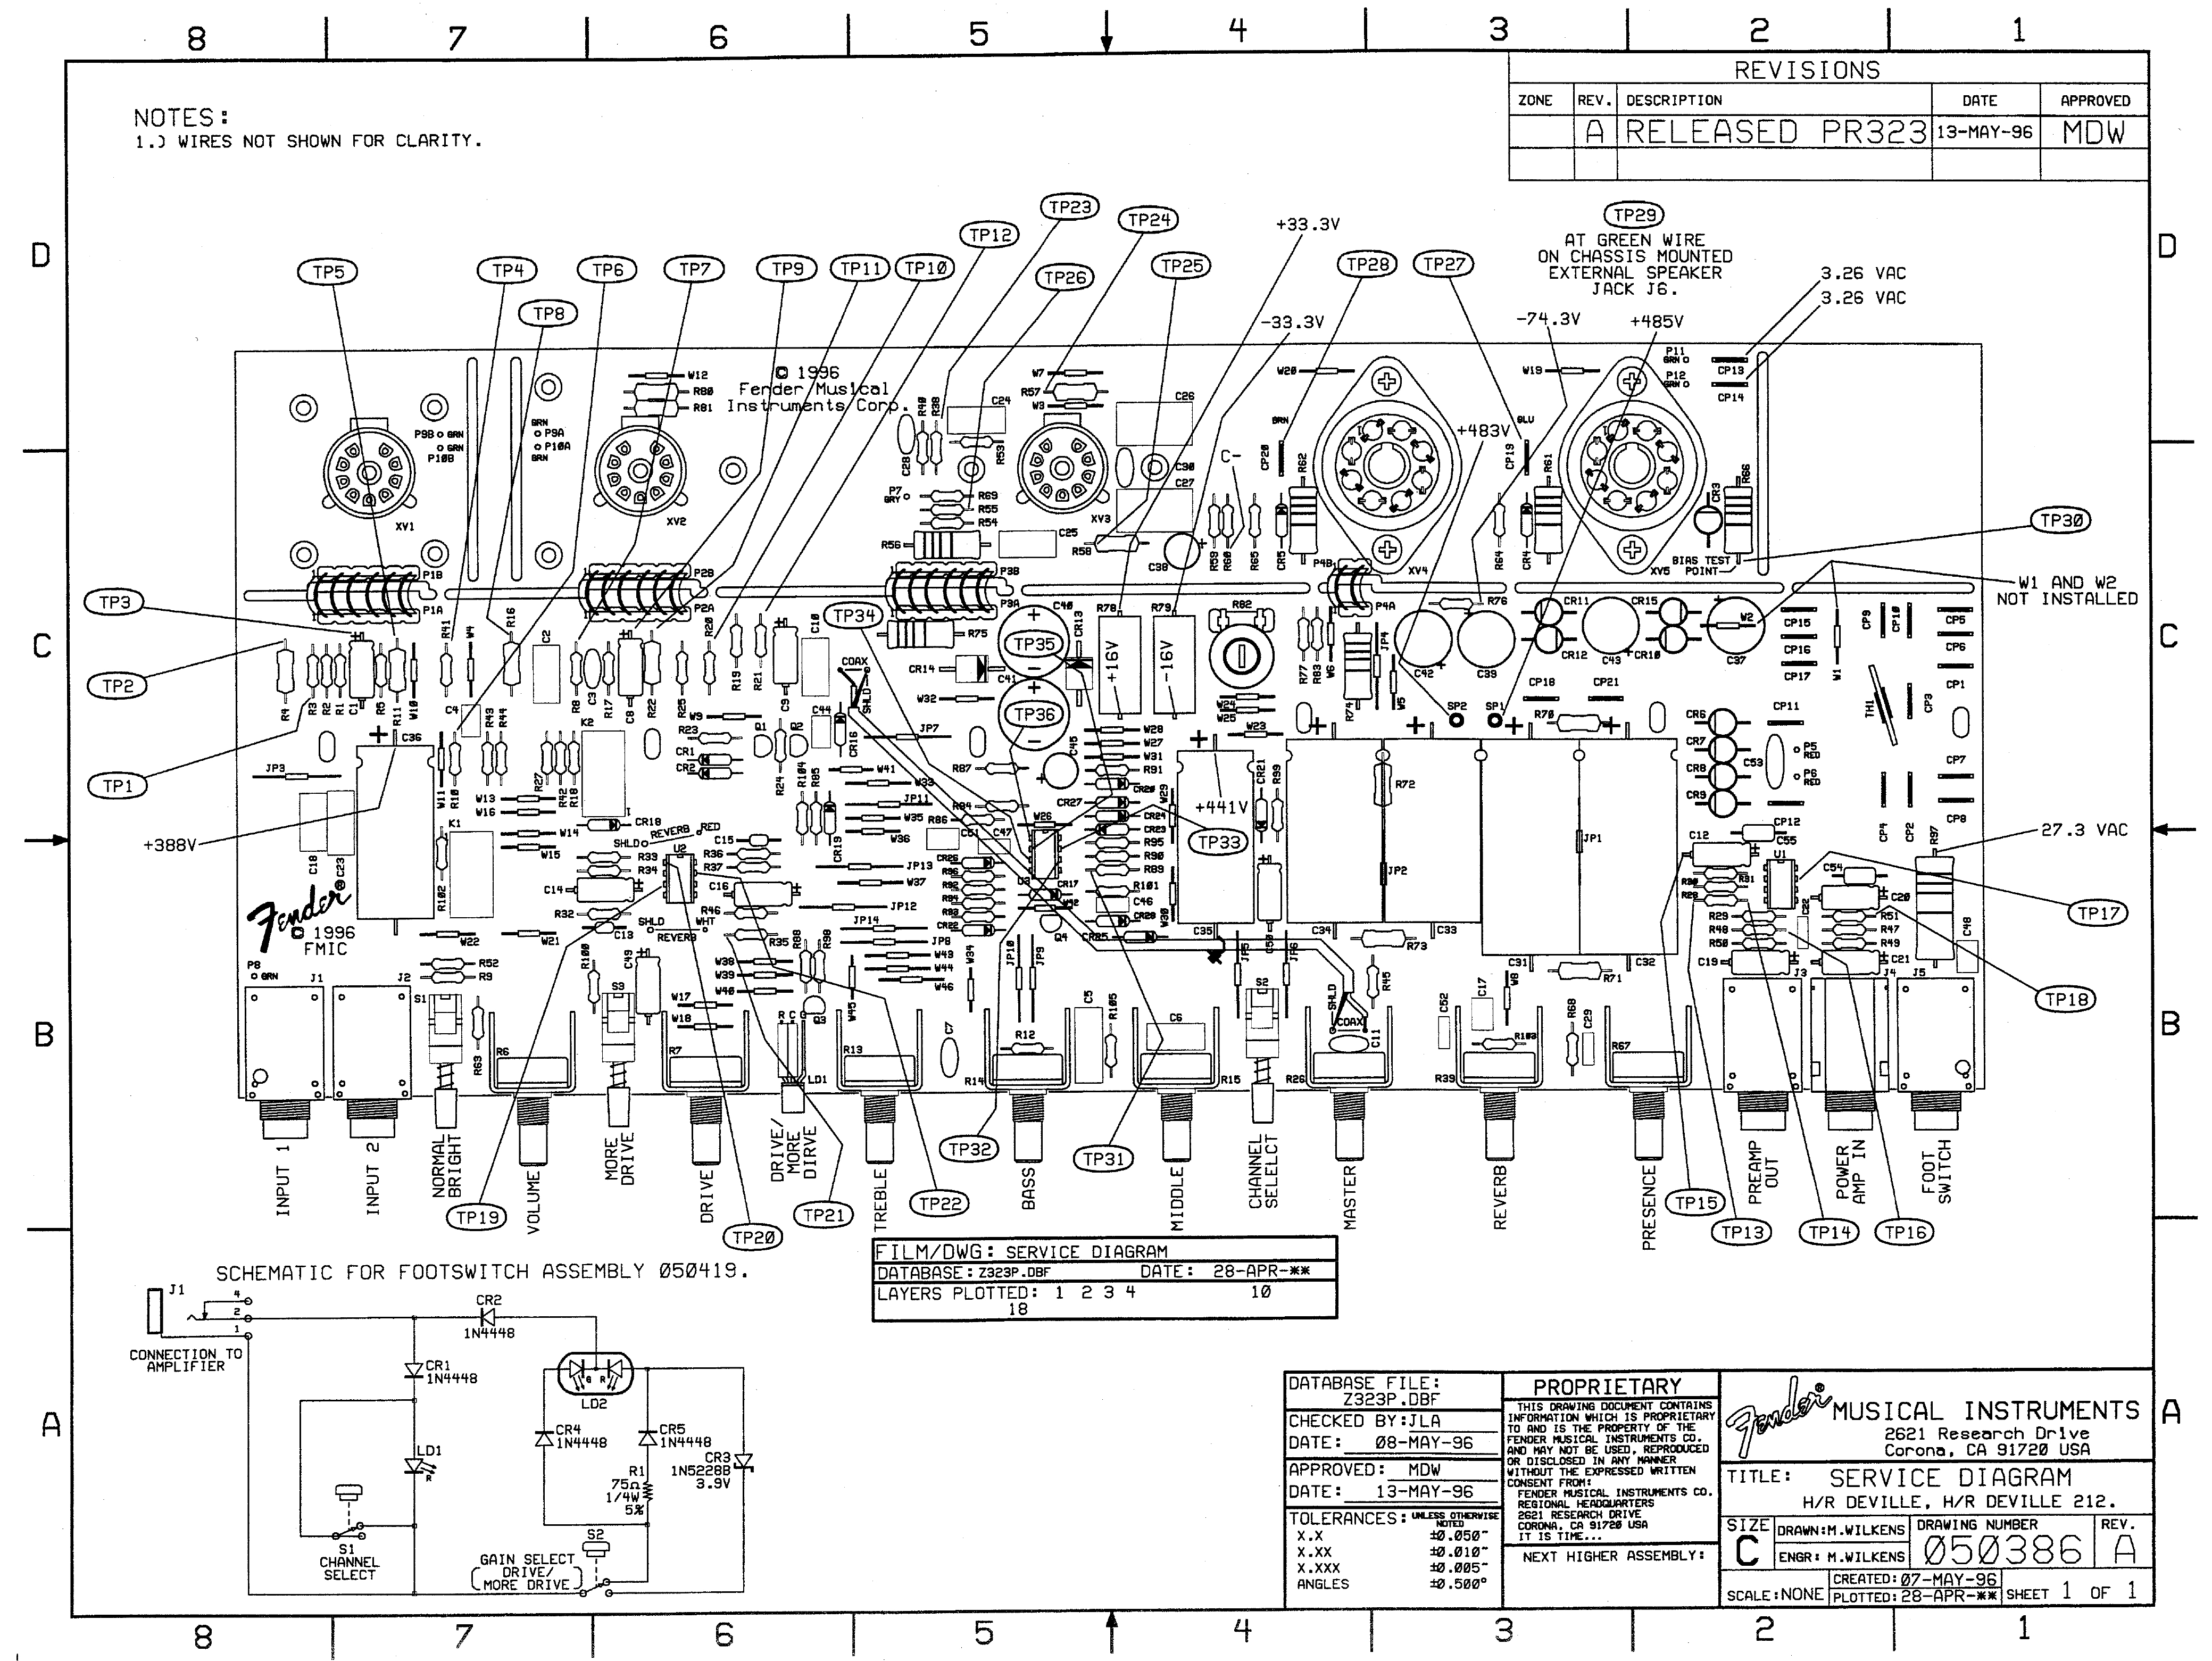 fender amp schematic diagrams